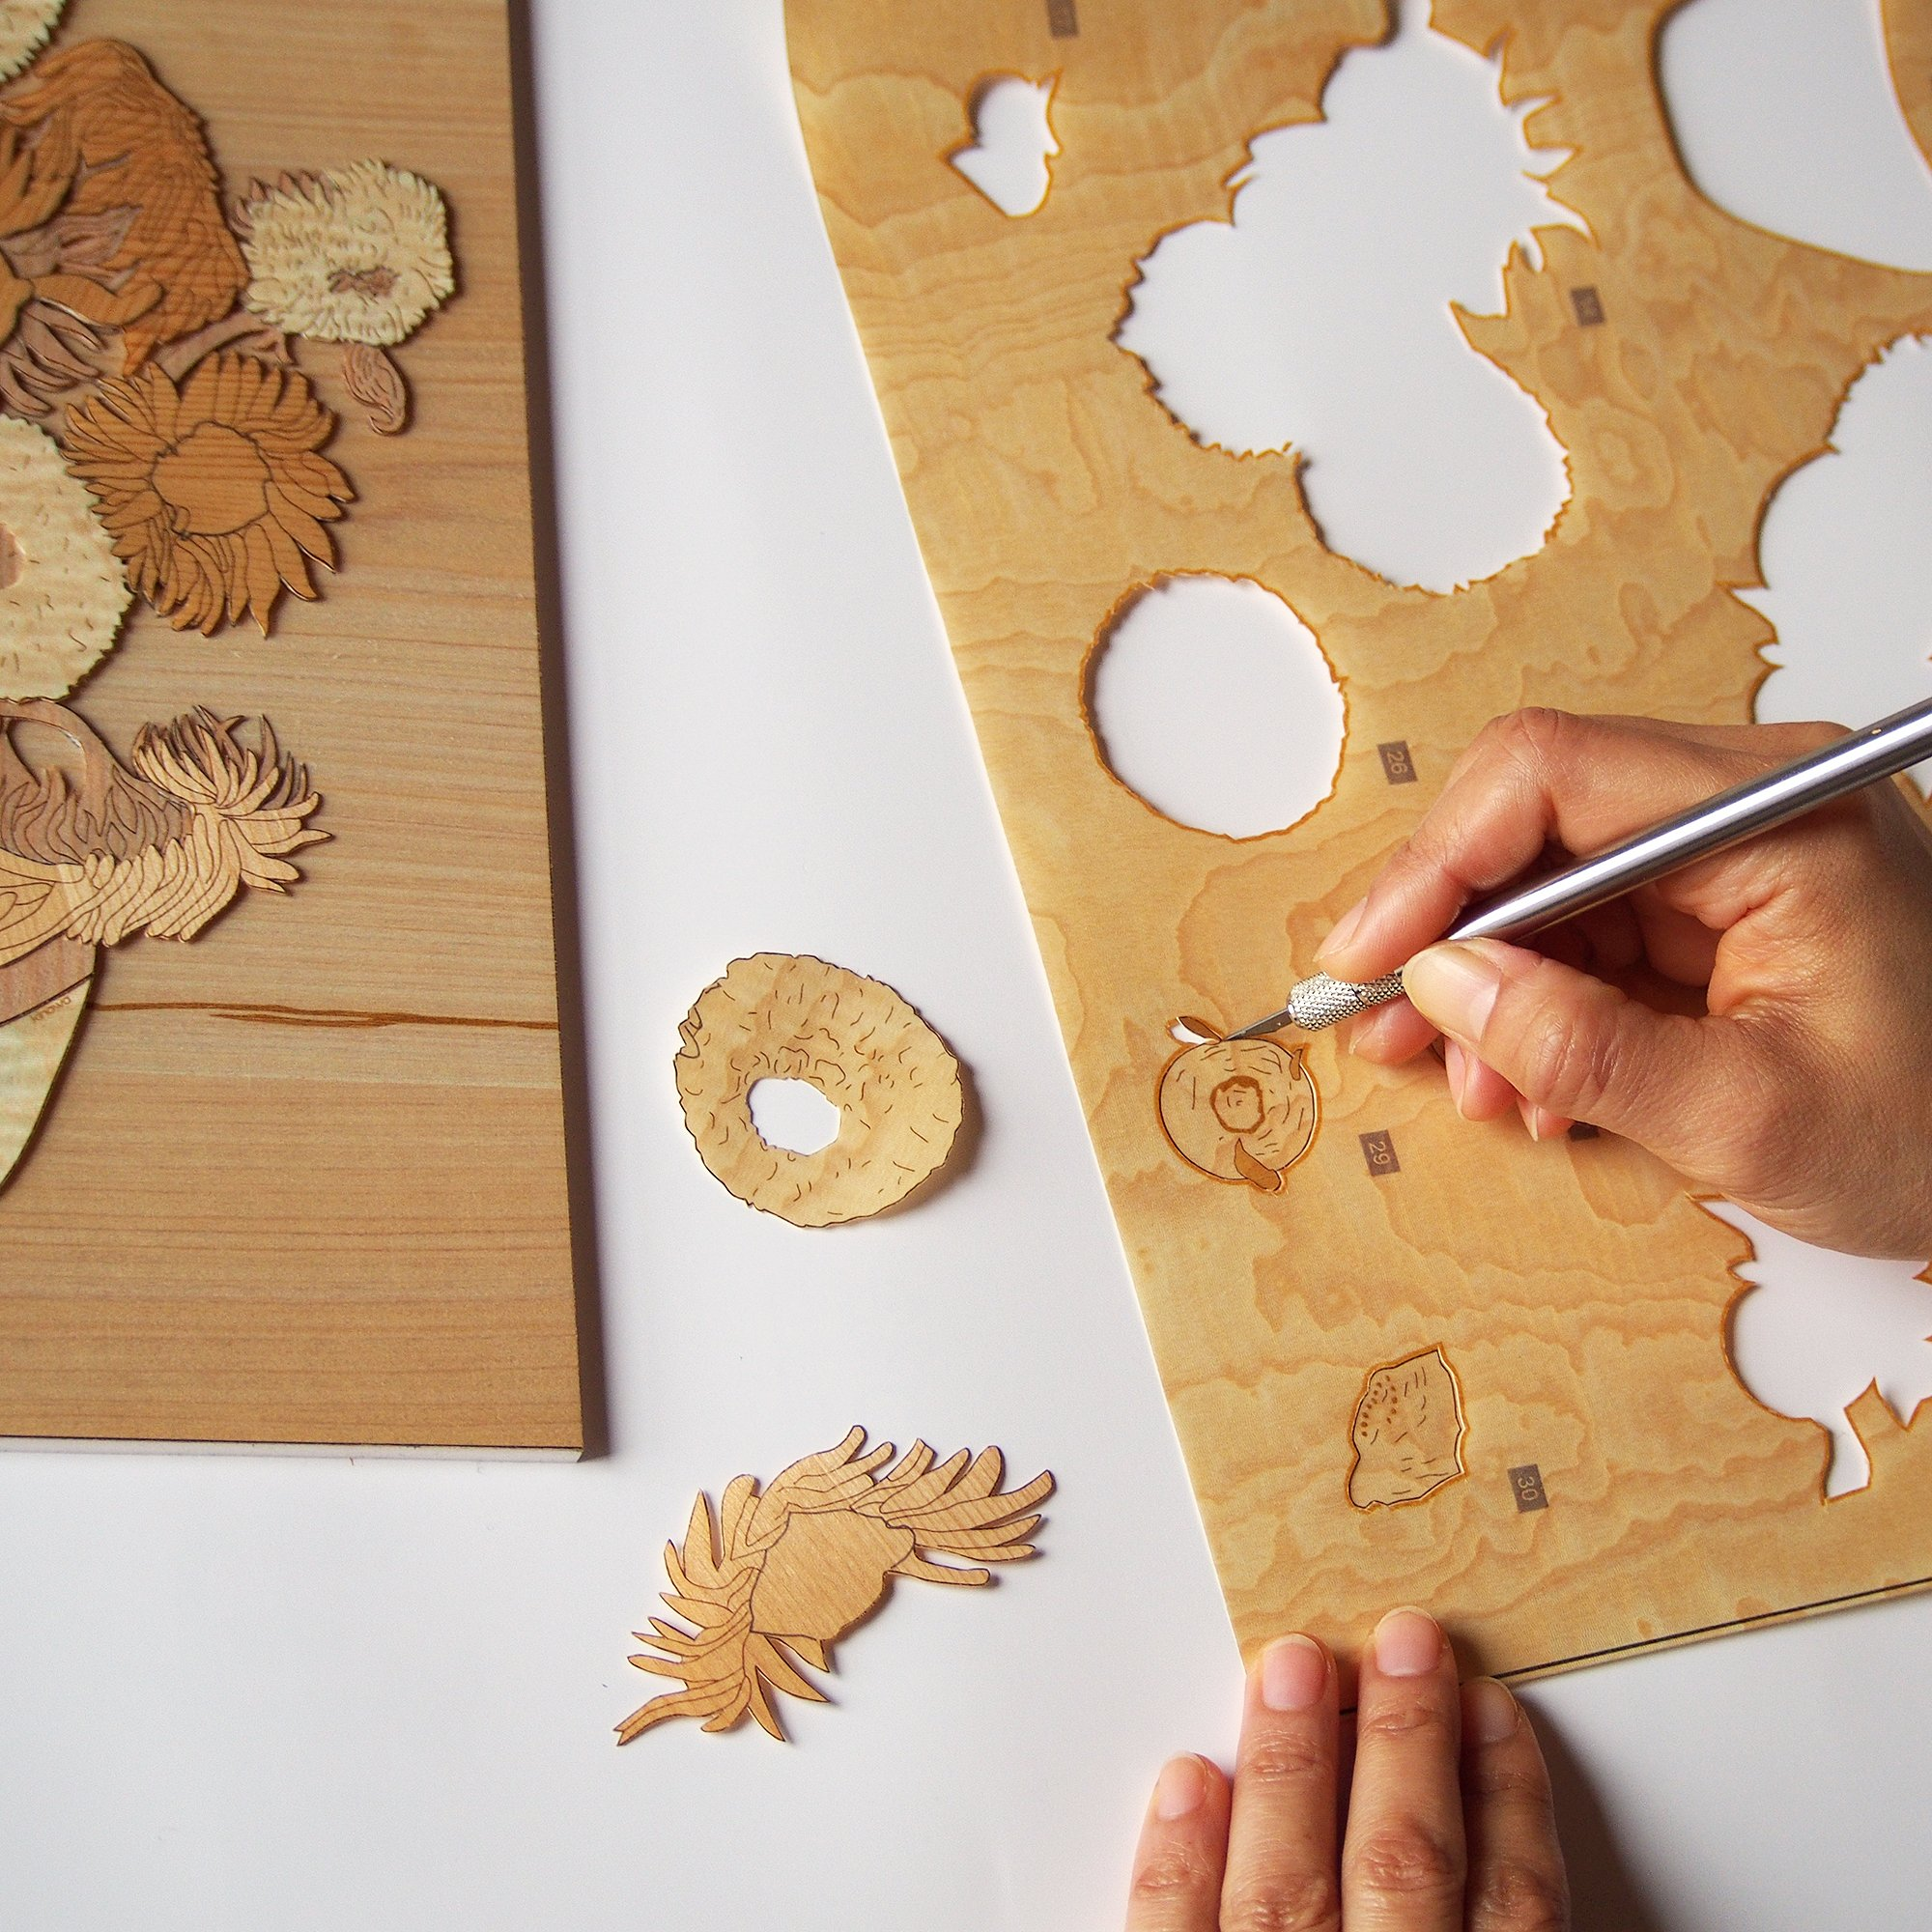 KINOWA Wooden Art Kit Kiharie Sunflowers Made in Japan by KINOWA (Image #4)